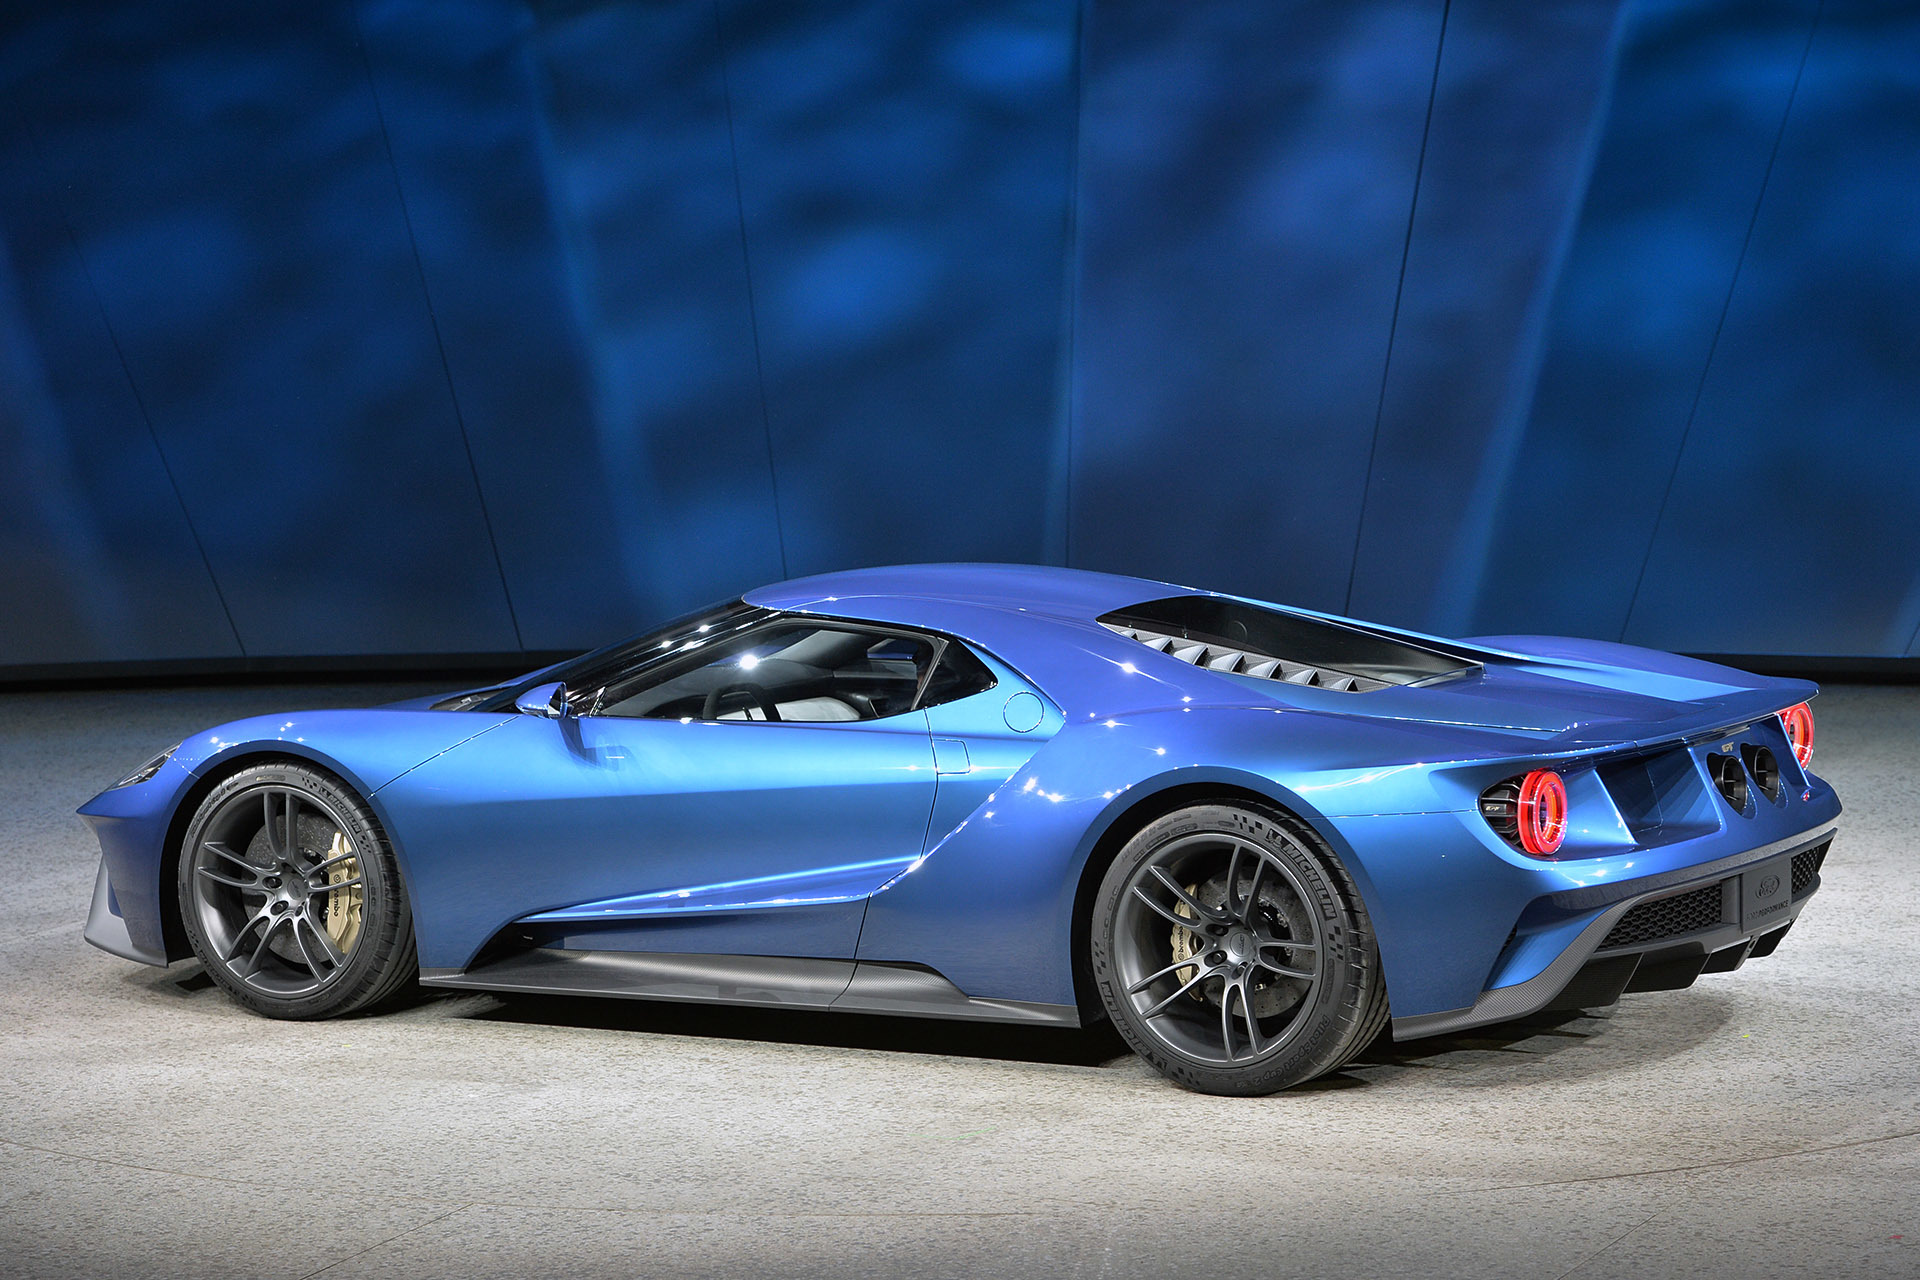 Aston Spypics also Maxresdefault likewise Tumblr M U Zsbrj Rb O likewise Aston Martin Vulcan X as well R C A Novation Carrosserie. on 2015 aston martin db9